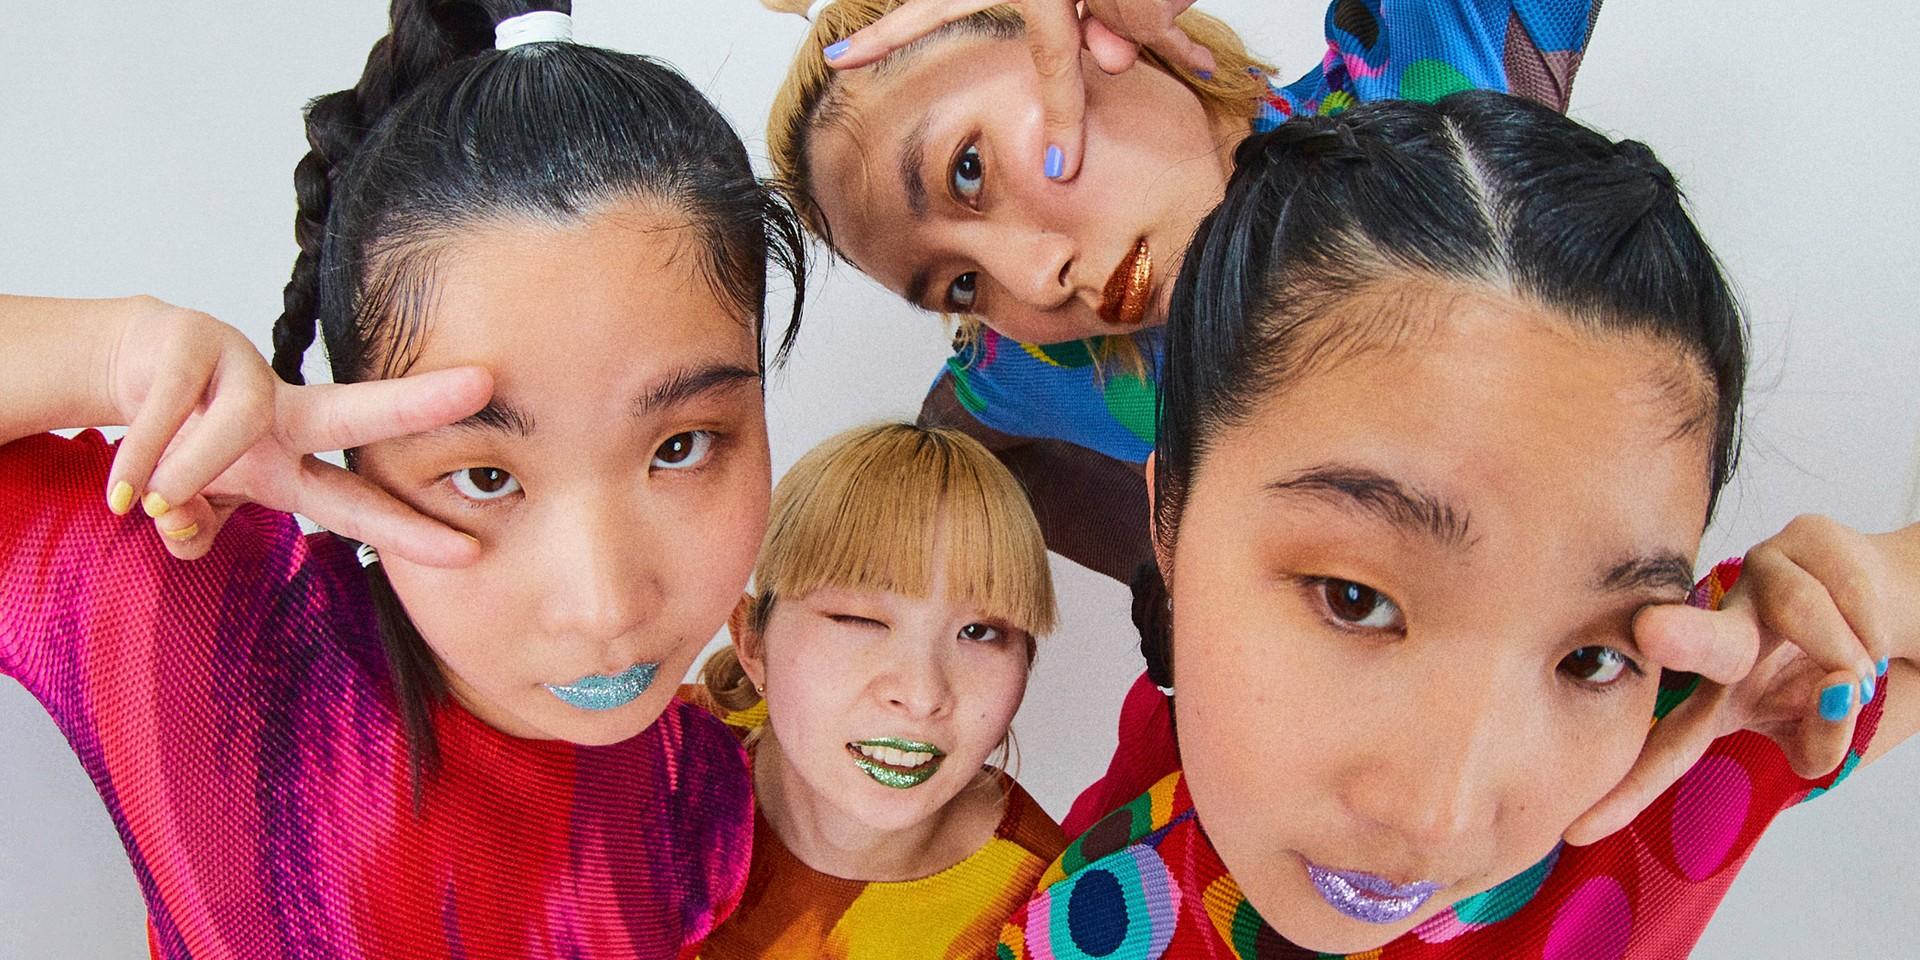 CHAI prove they've still got spunk on eclectic new album 'WINK' — listen